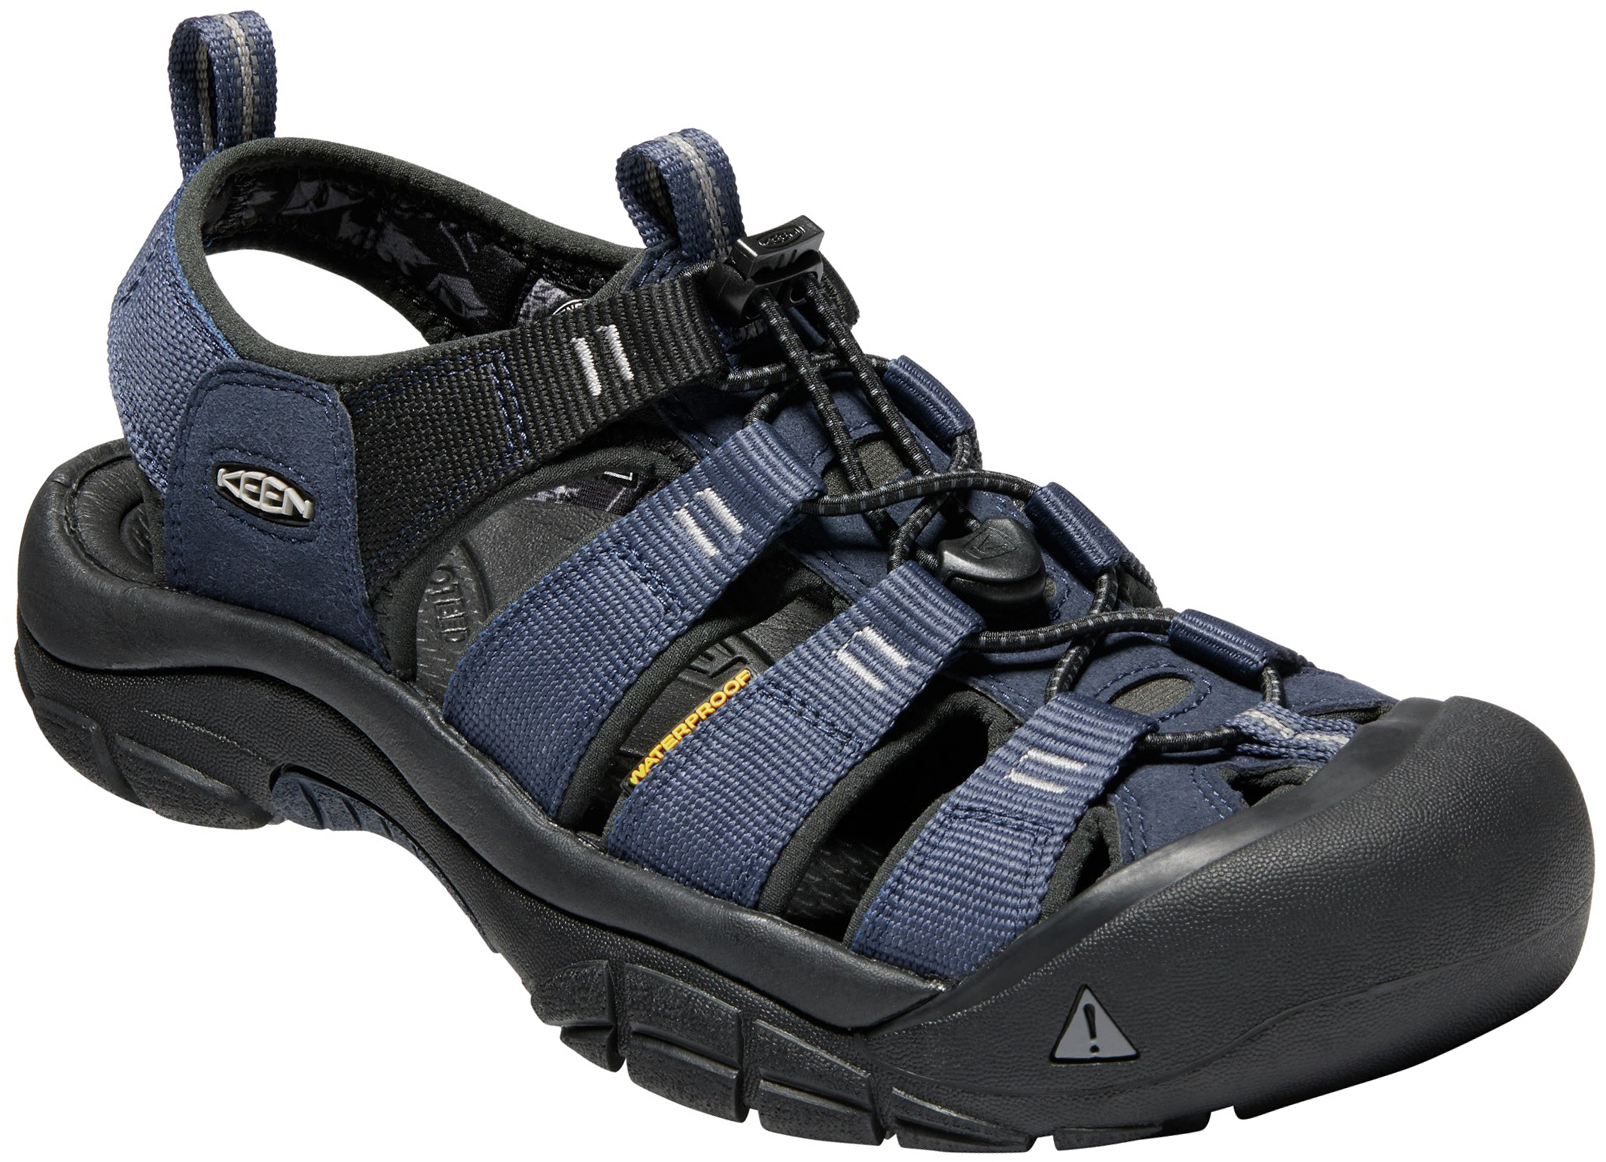 a7b2b3ed8b73 Water shoes